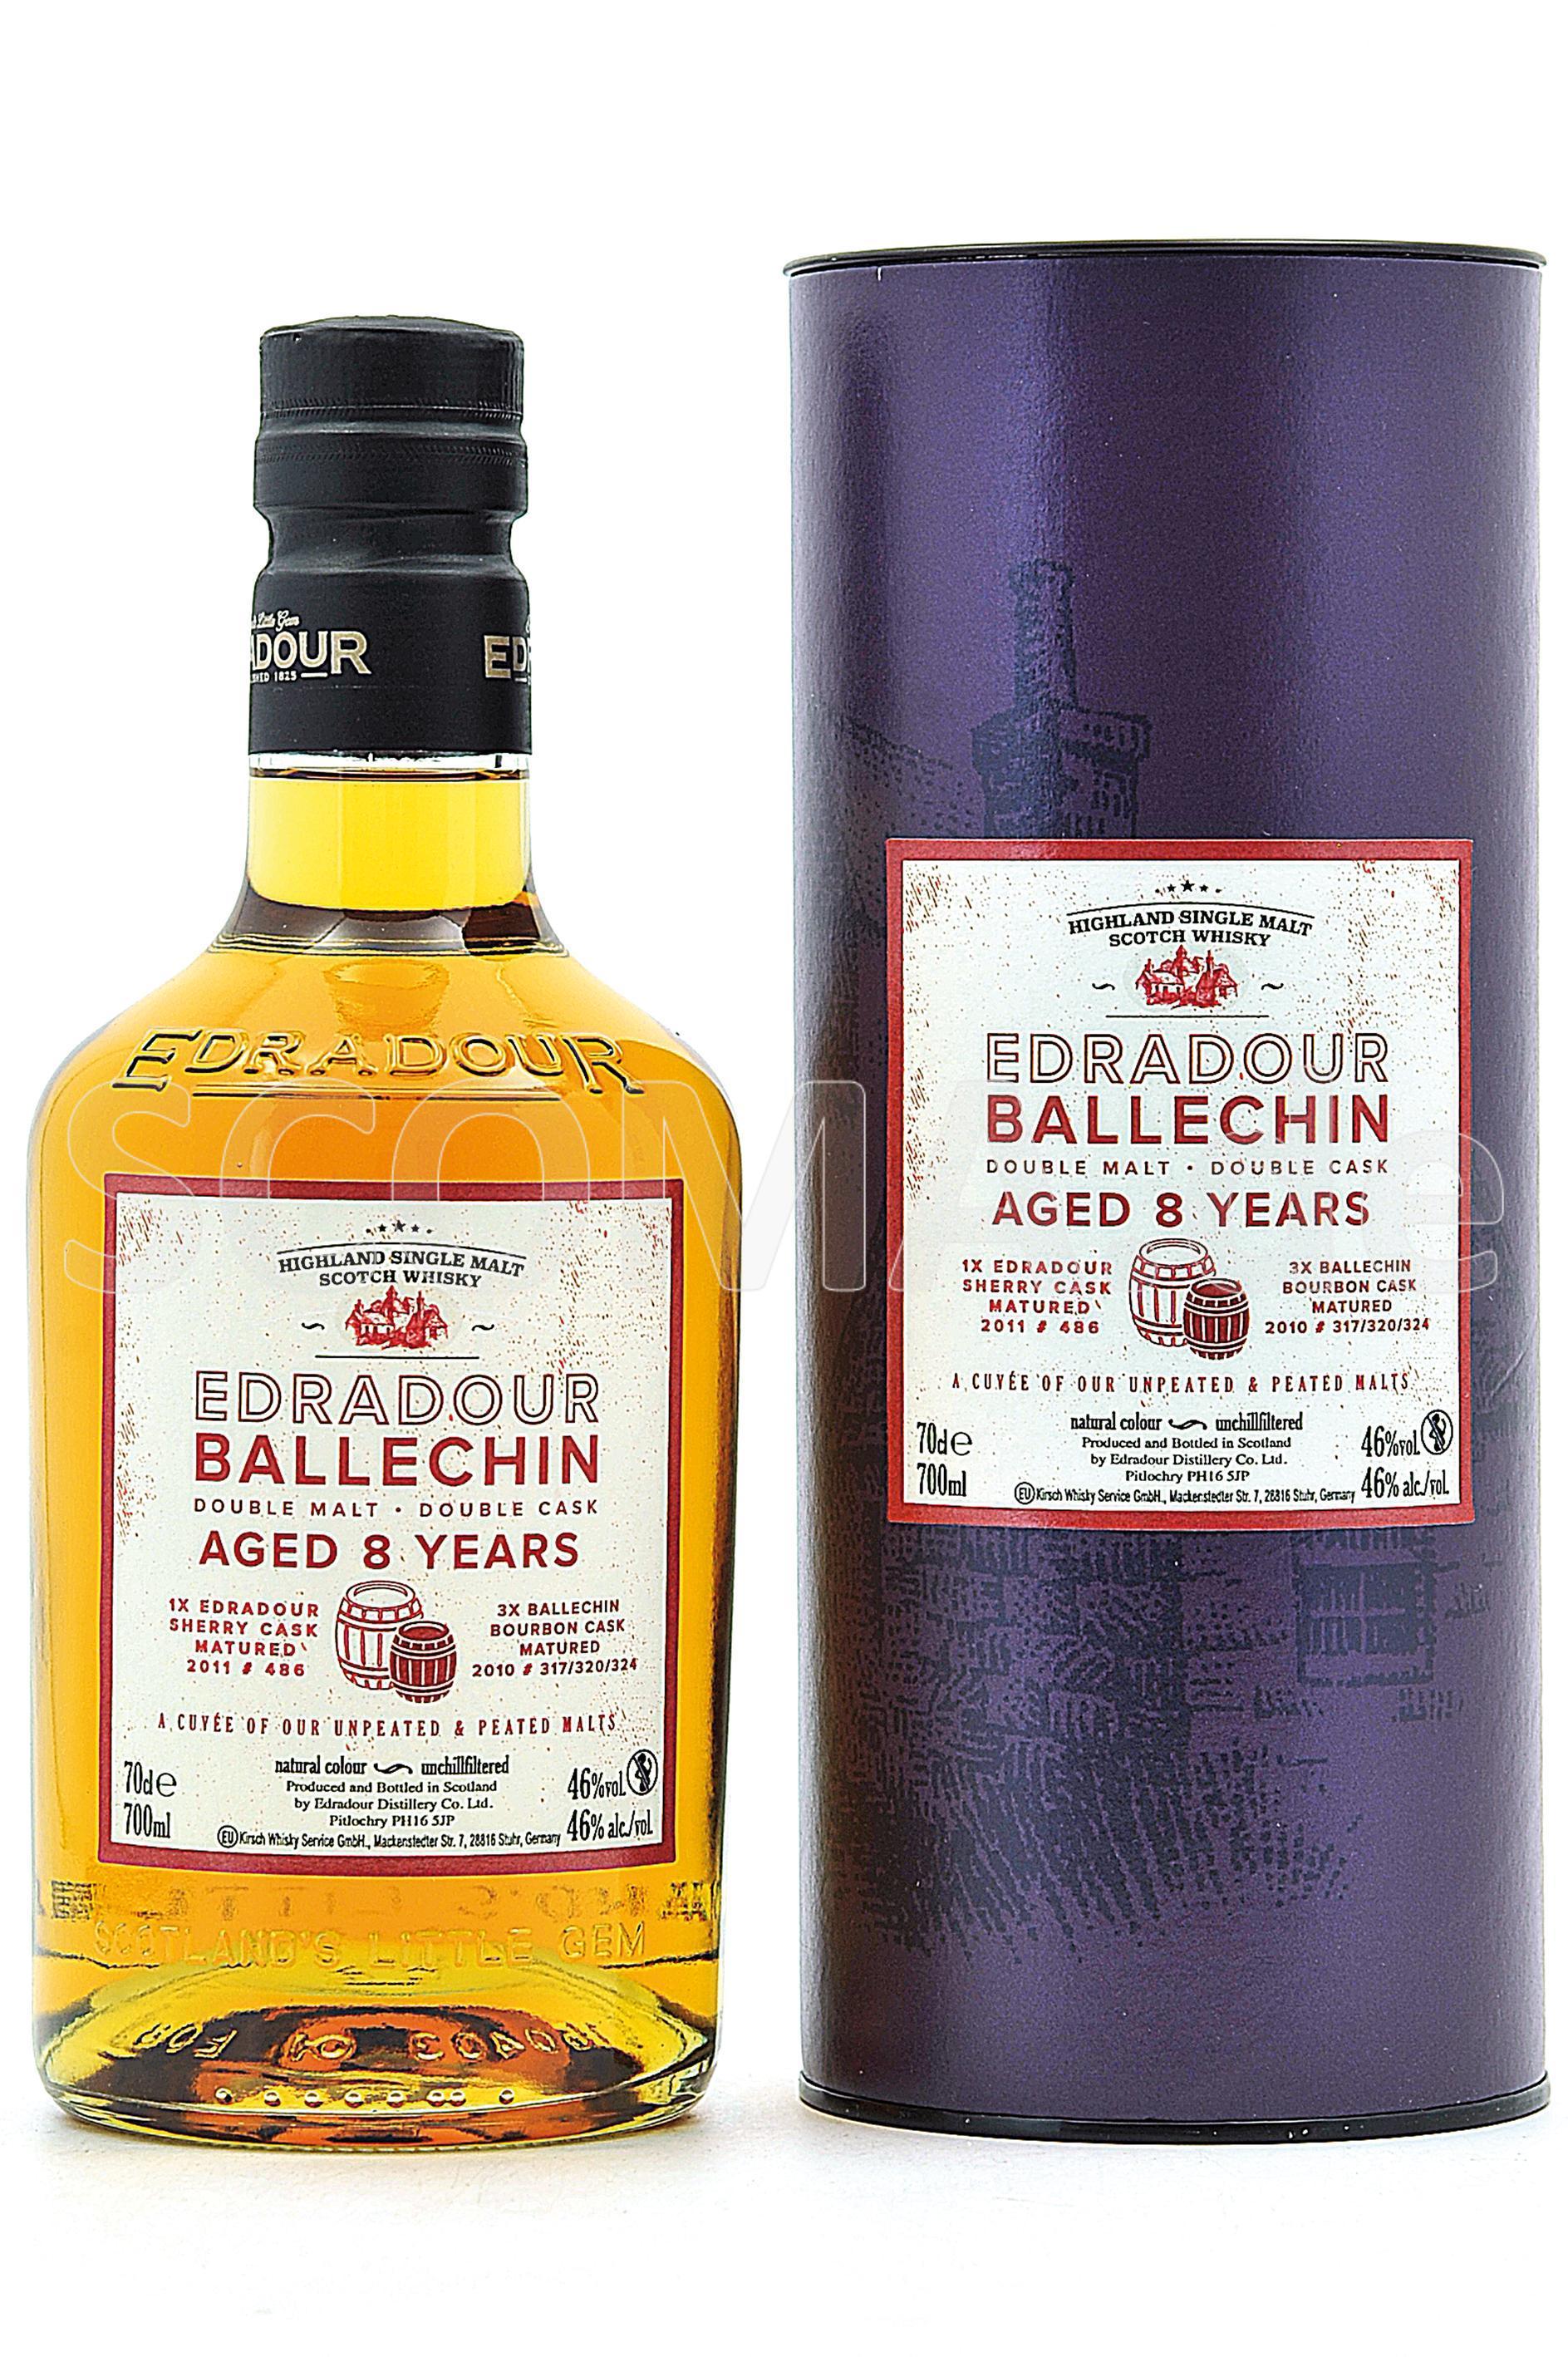 Edradour-Ballechin Cuvee 8 yea...